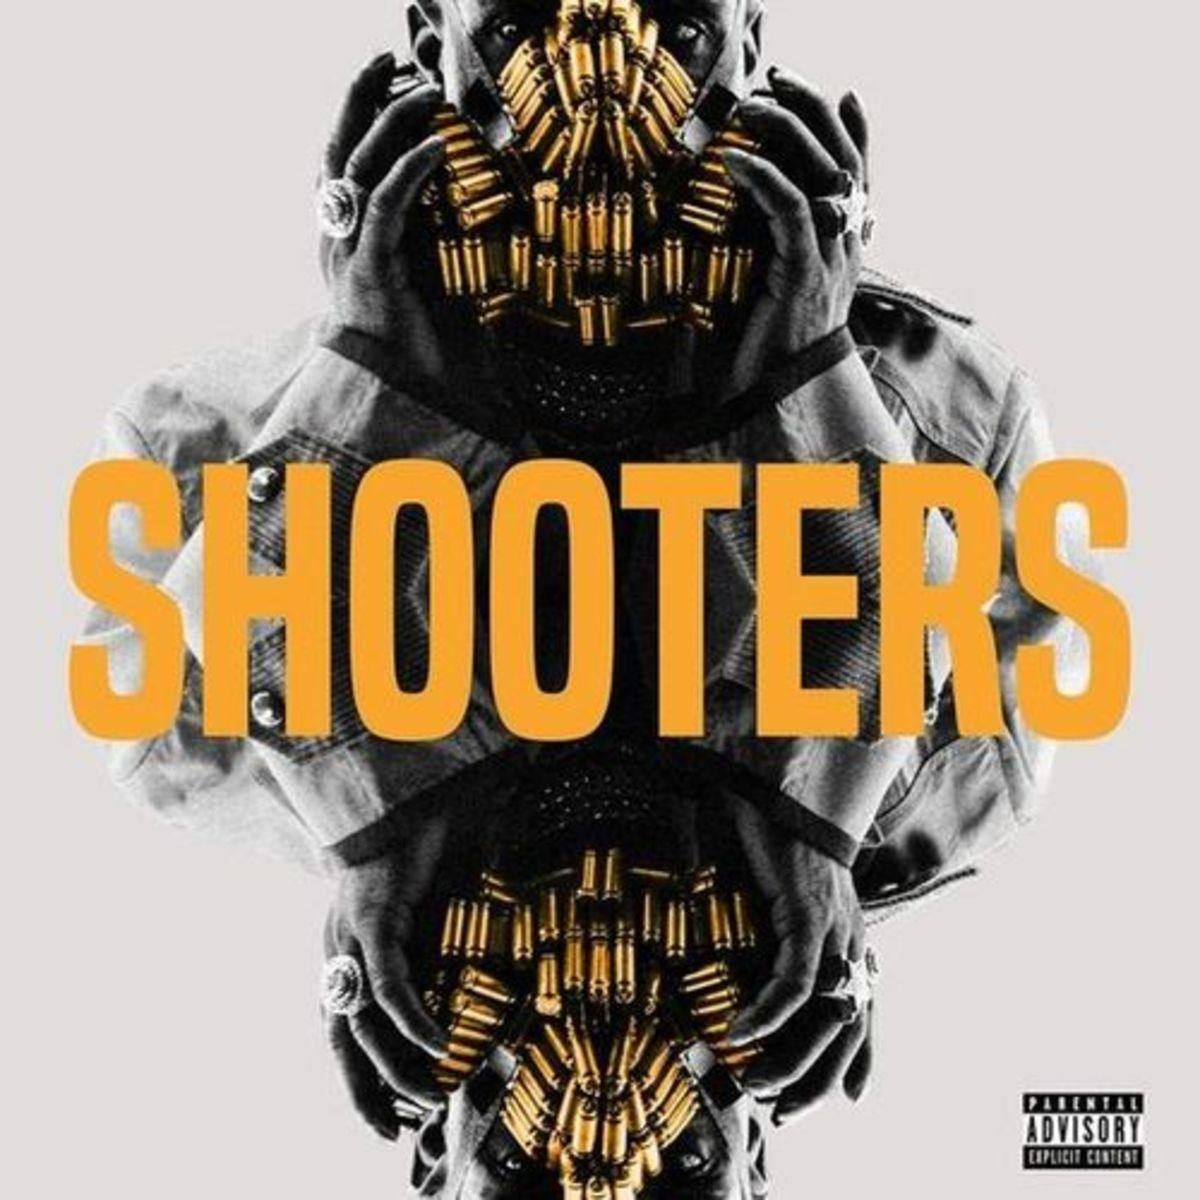 tory-lanez-shooters.jpg